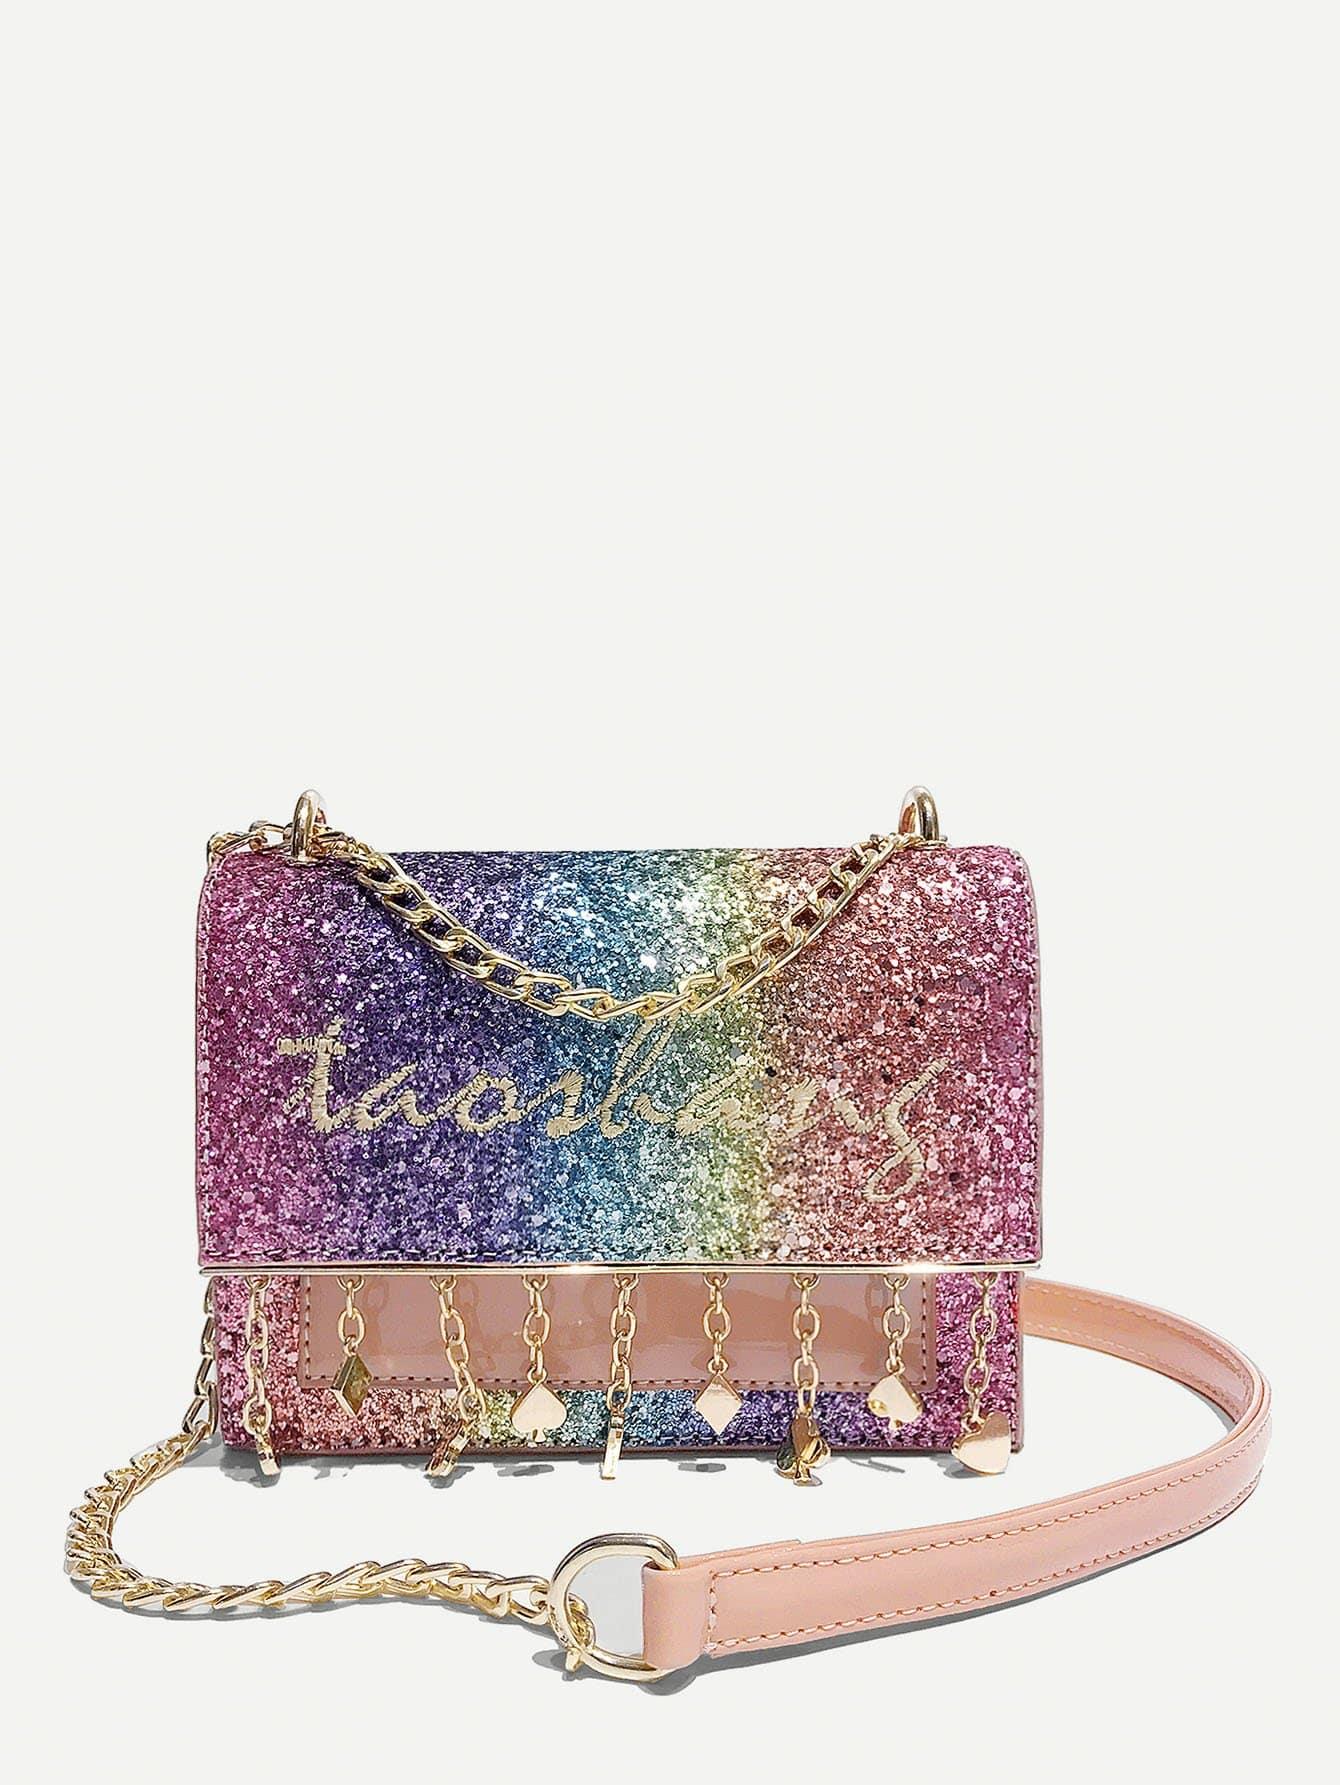 Embroidered Detail Glitter Shoulder Bag star detail glitter crossbody bag